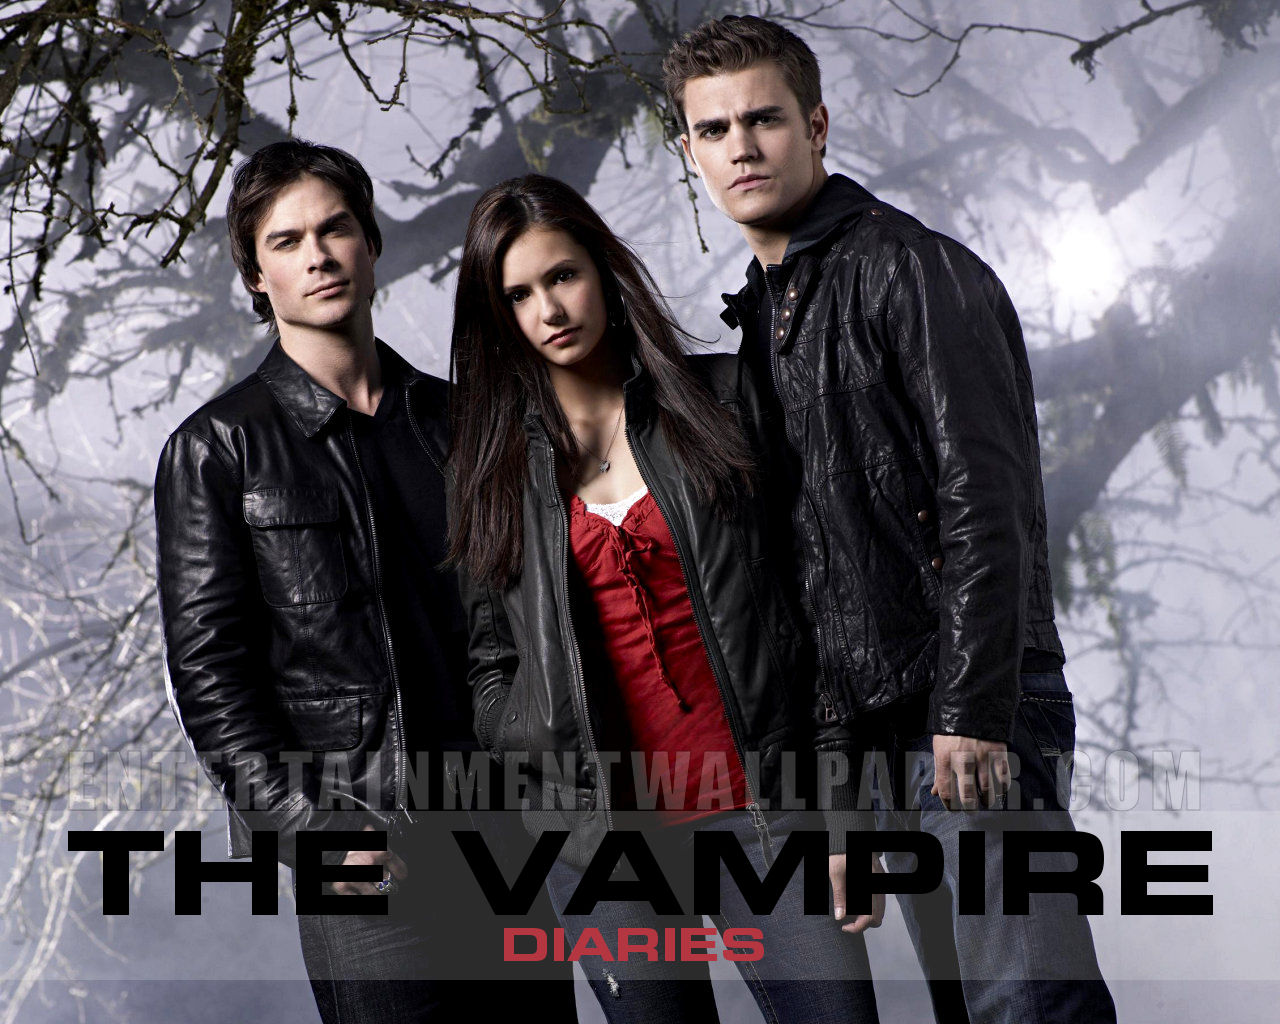 Index Of Vampire Diaries With English Subtitles